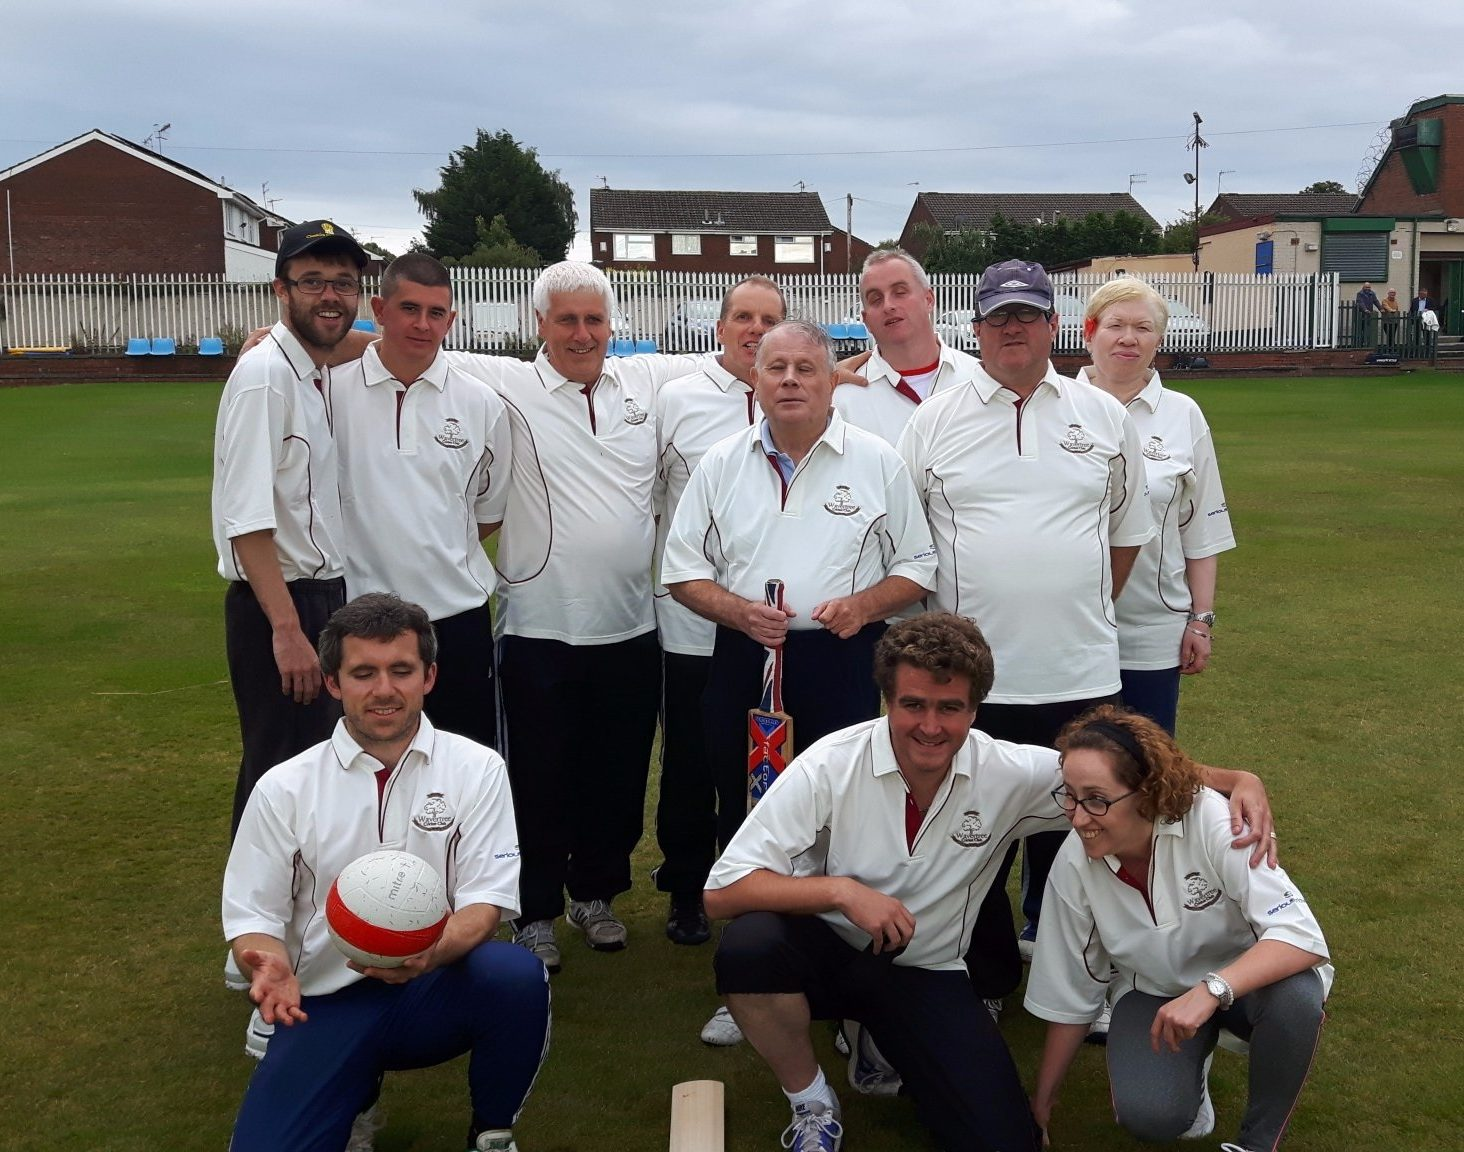 Image shows Matt stood with his Wavertree CC teammates